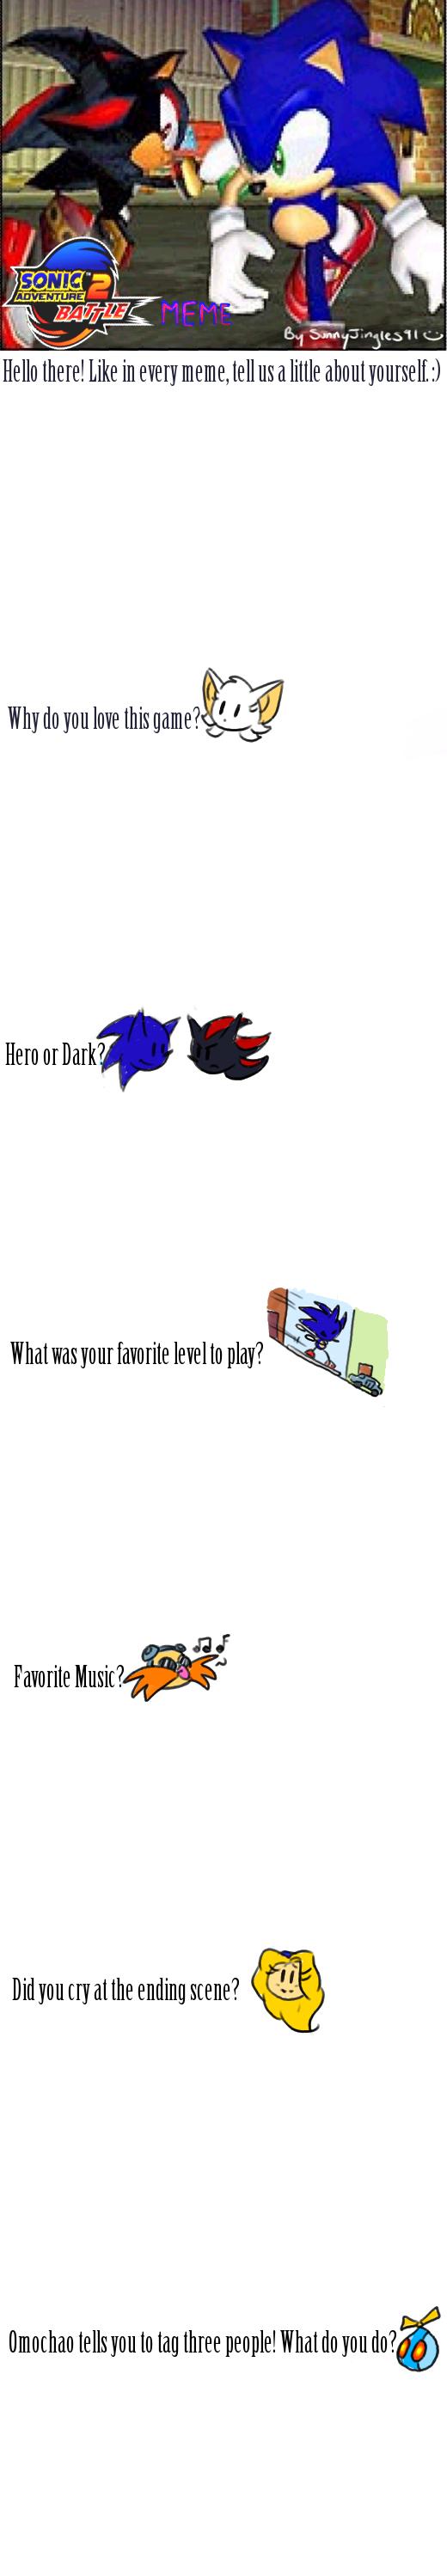 Sonic Adventure 2 Meme by Chicaaaaa